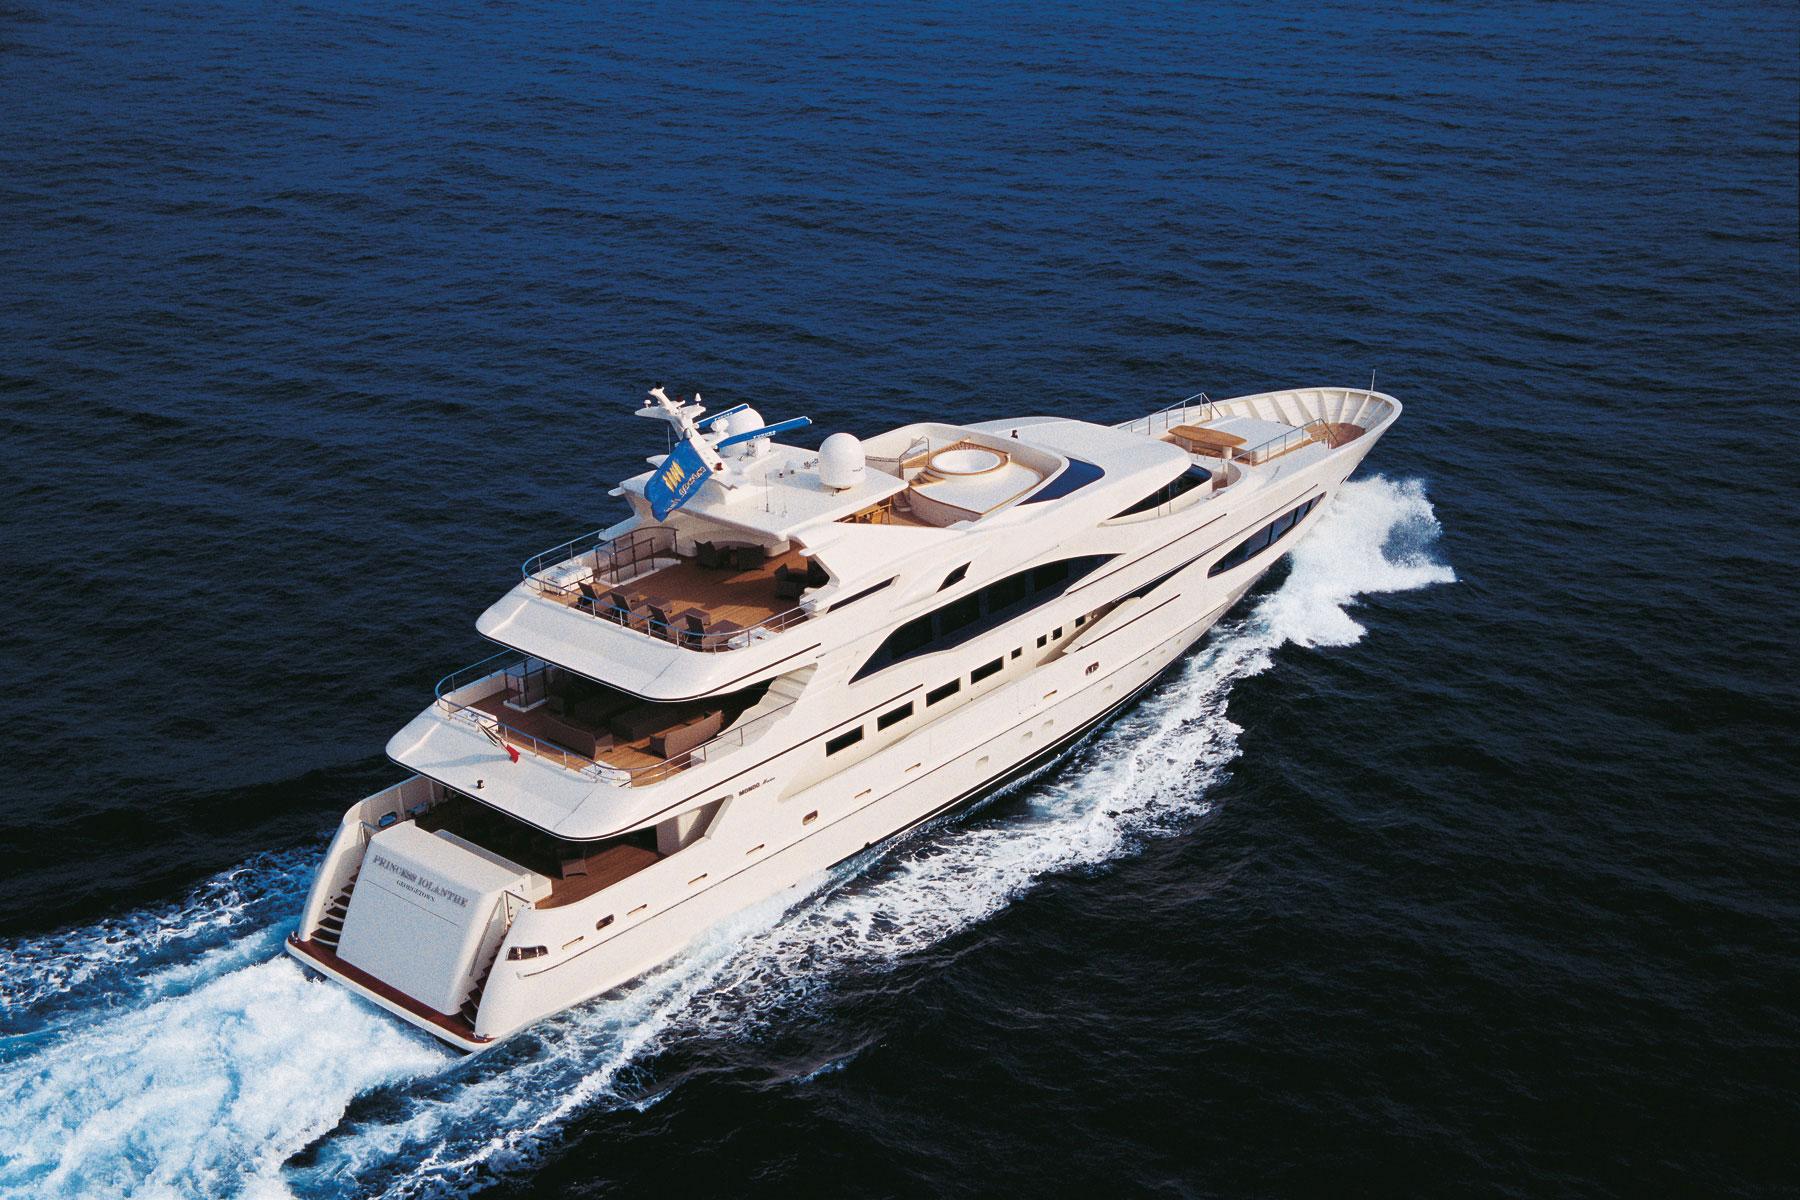 PRINCESS IOLANTHE Yacht Charter Details MondoMarine